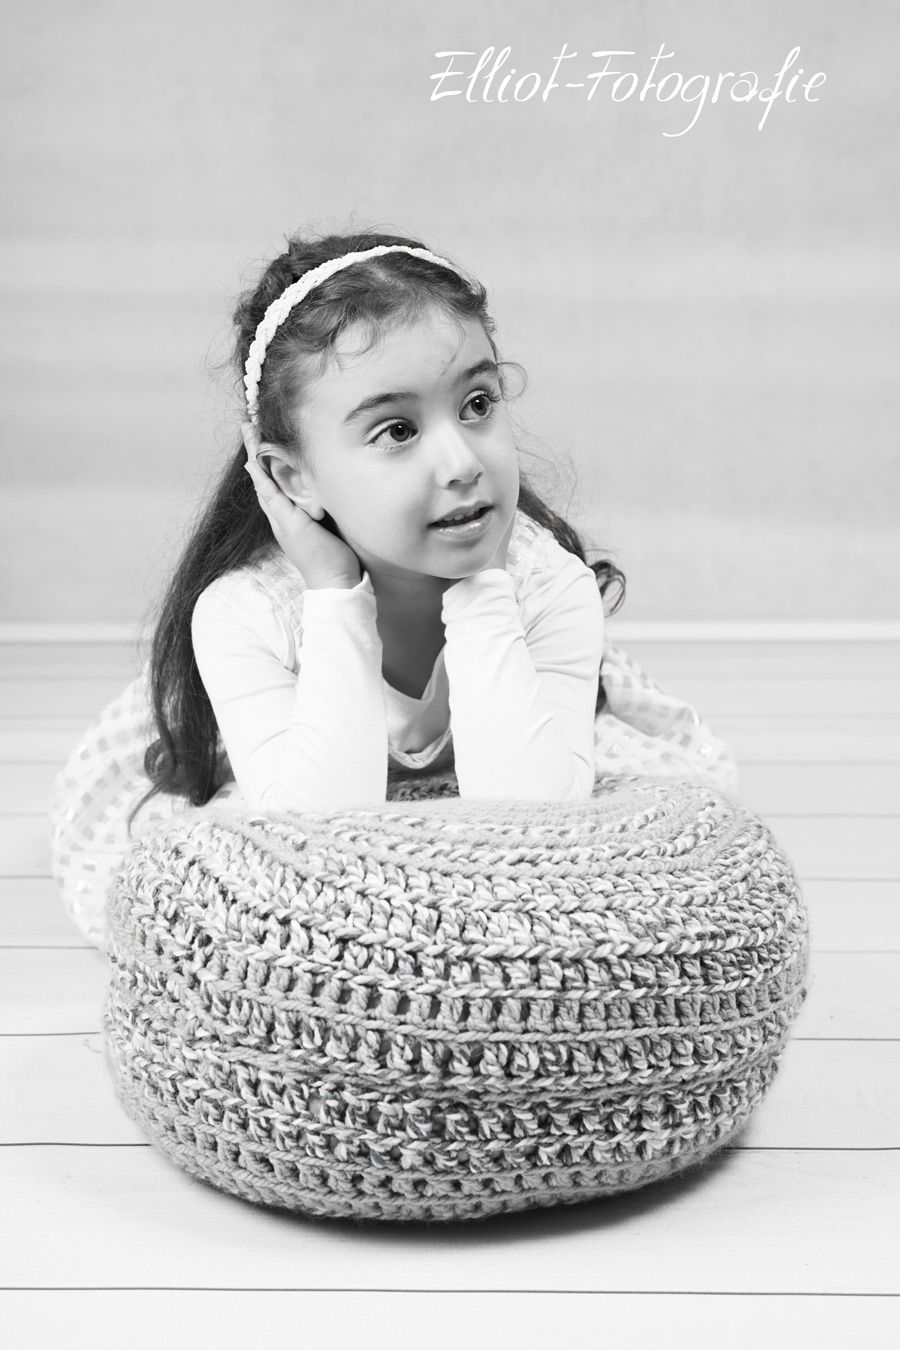 #Kindergarten #Fotografie #Photography #Inspiration #Backdrop #LJ #ElliotFotografie